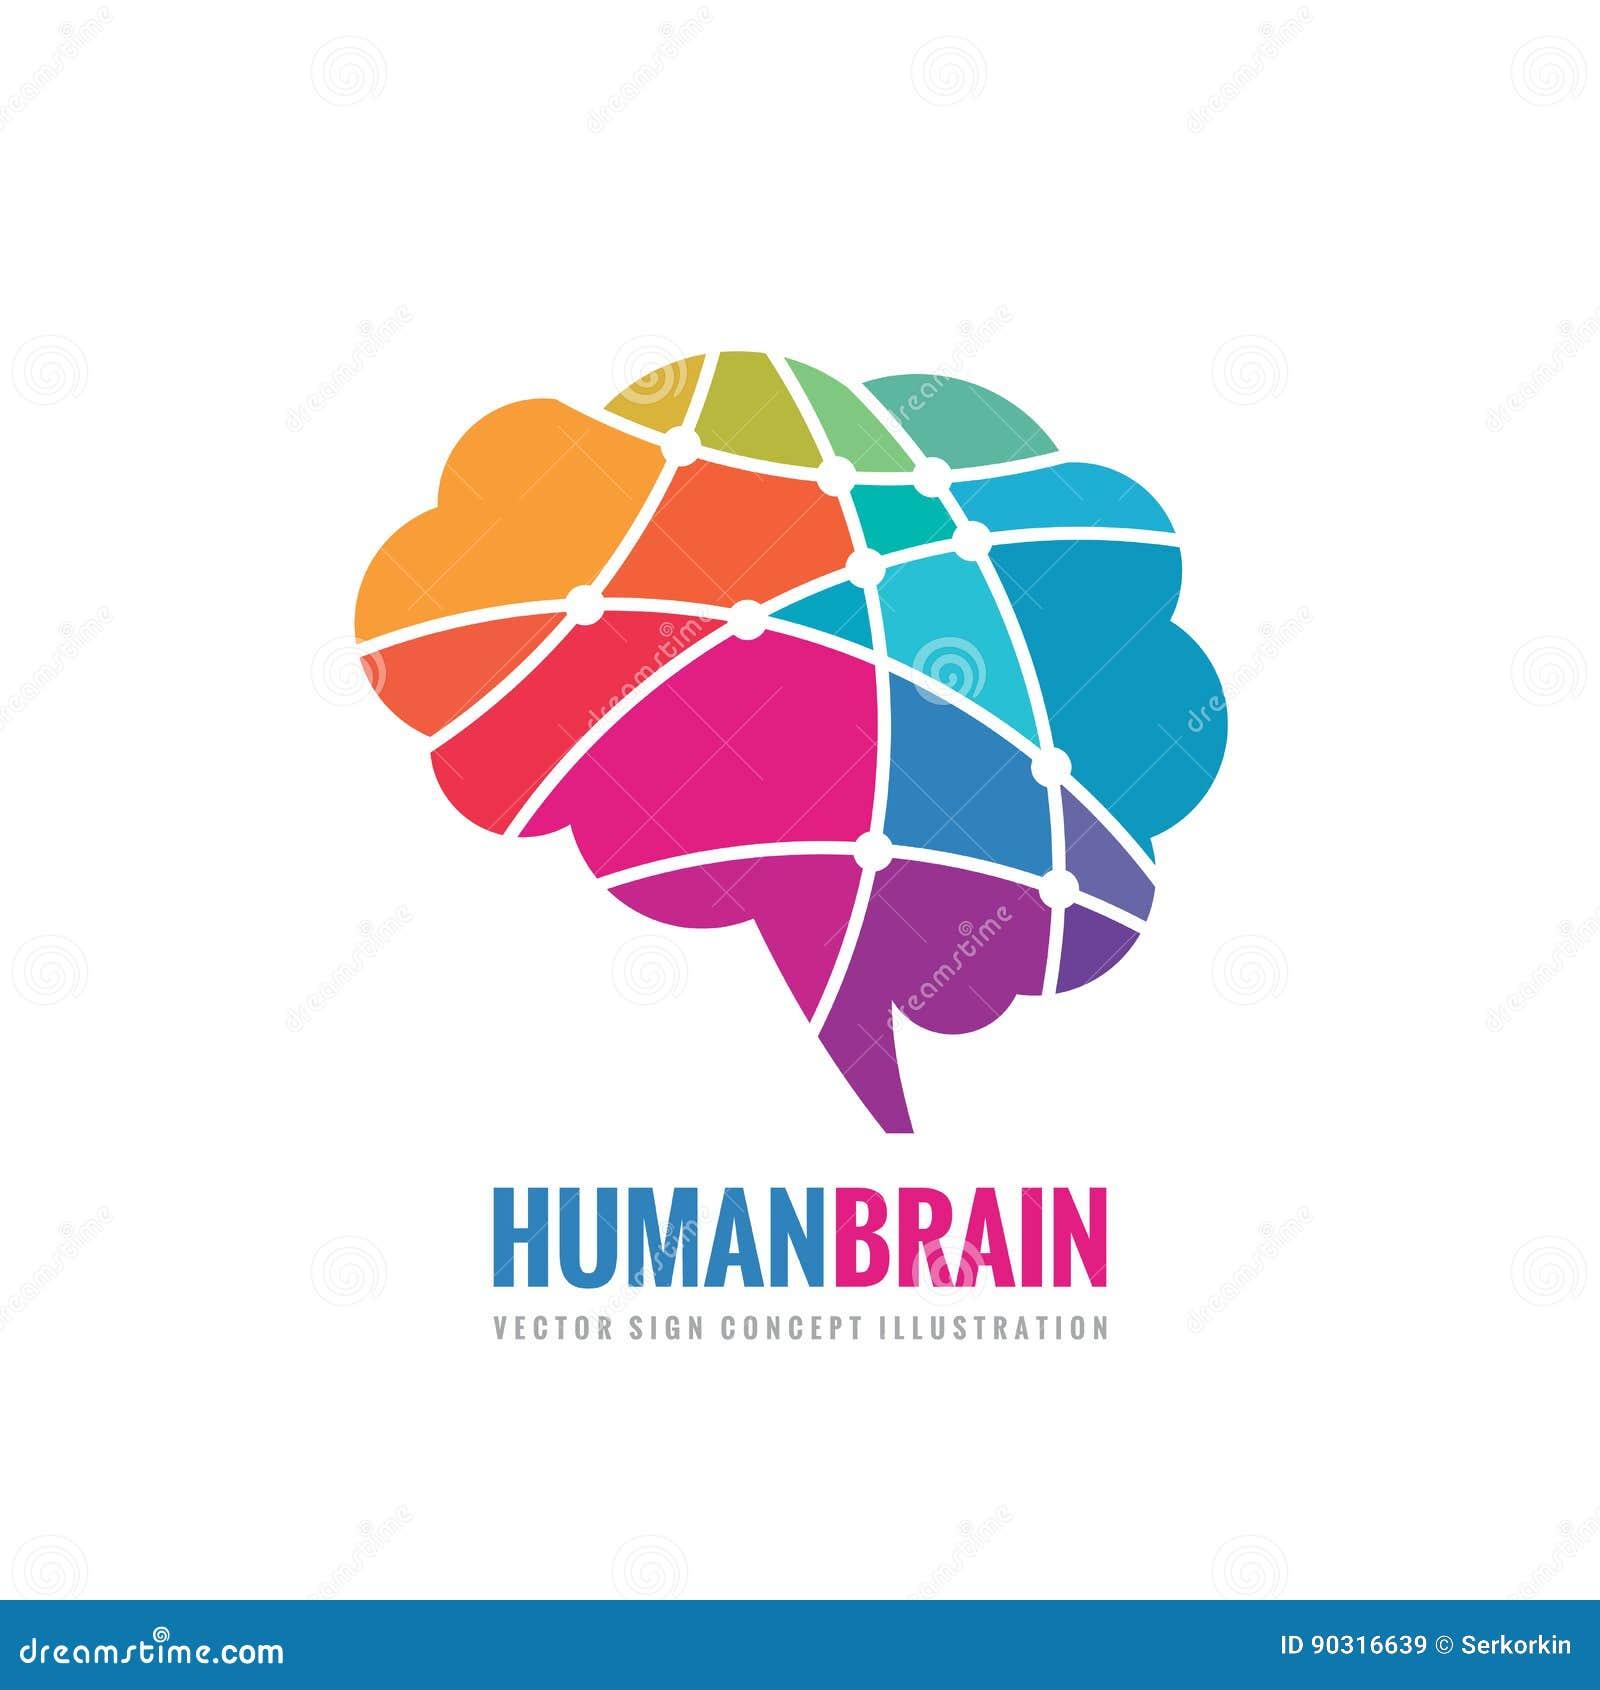 Human Brain - business vector logo template concept illustration. Abstract creative idea sign. Design element